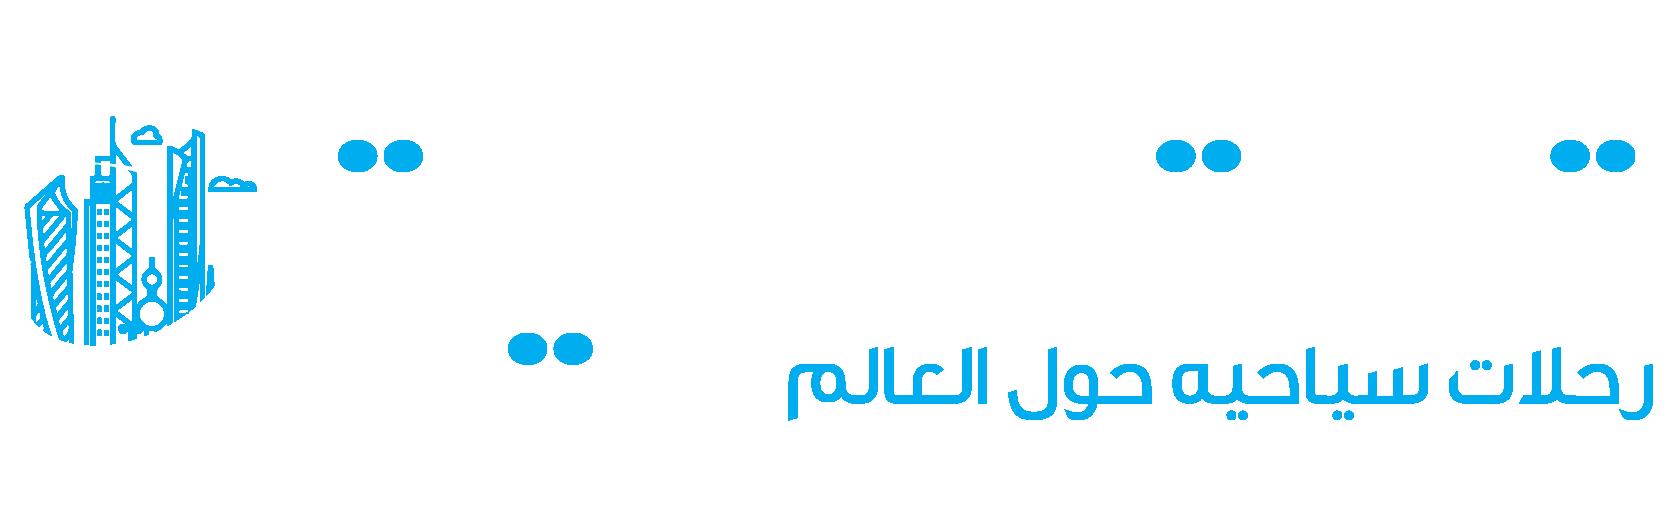 Ciudadela de Kuwait